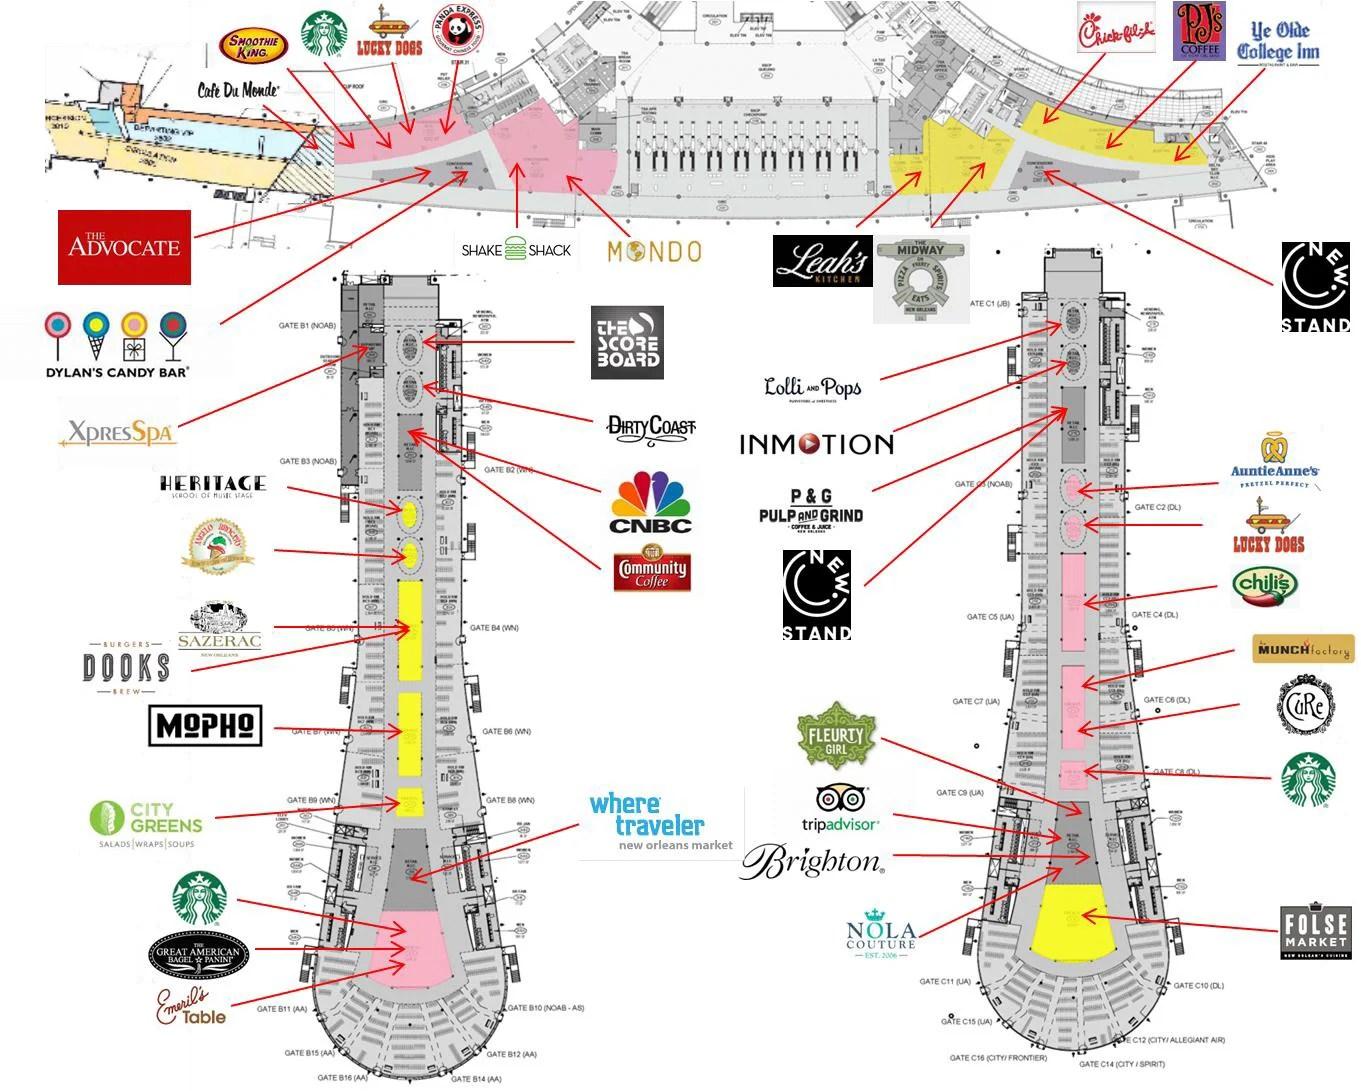 Starbucks Supply Chain Diagram Printable Wiring Diagram Schematic